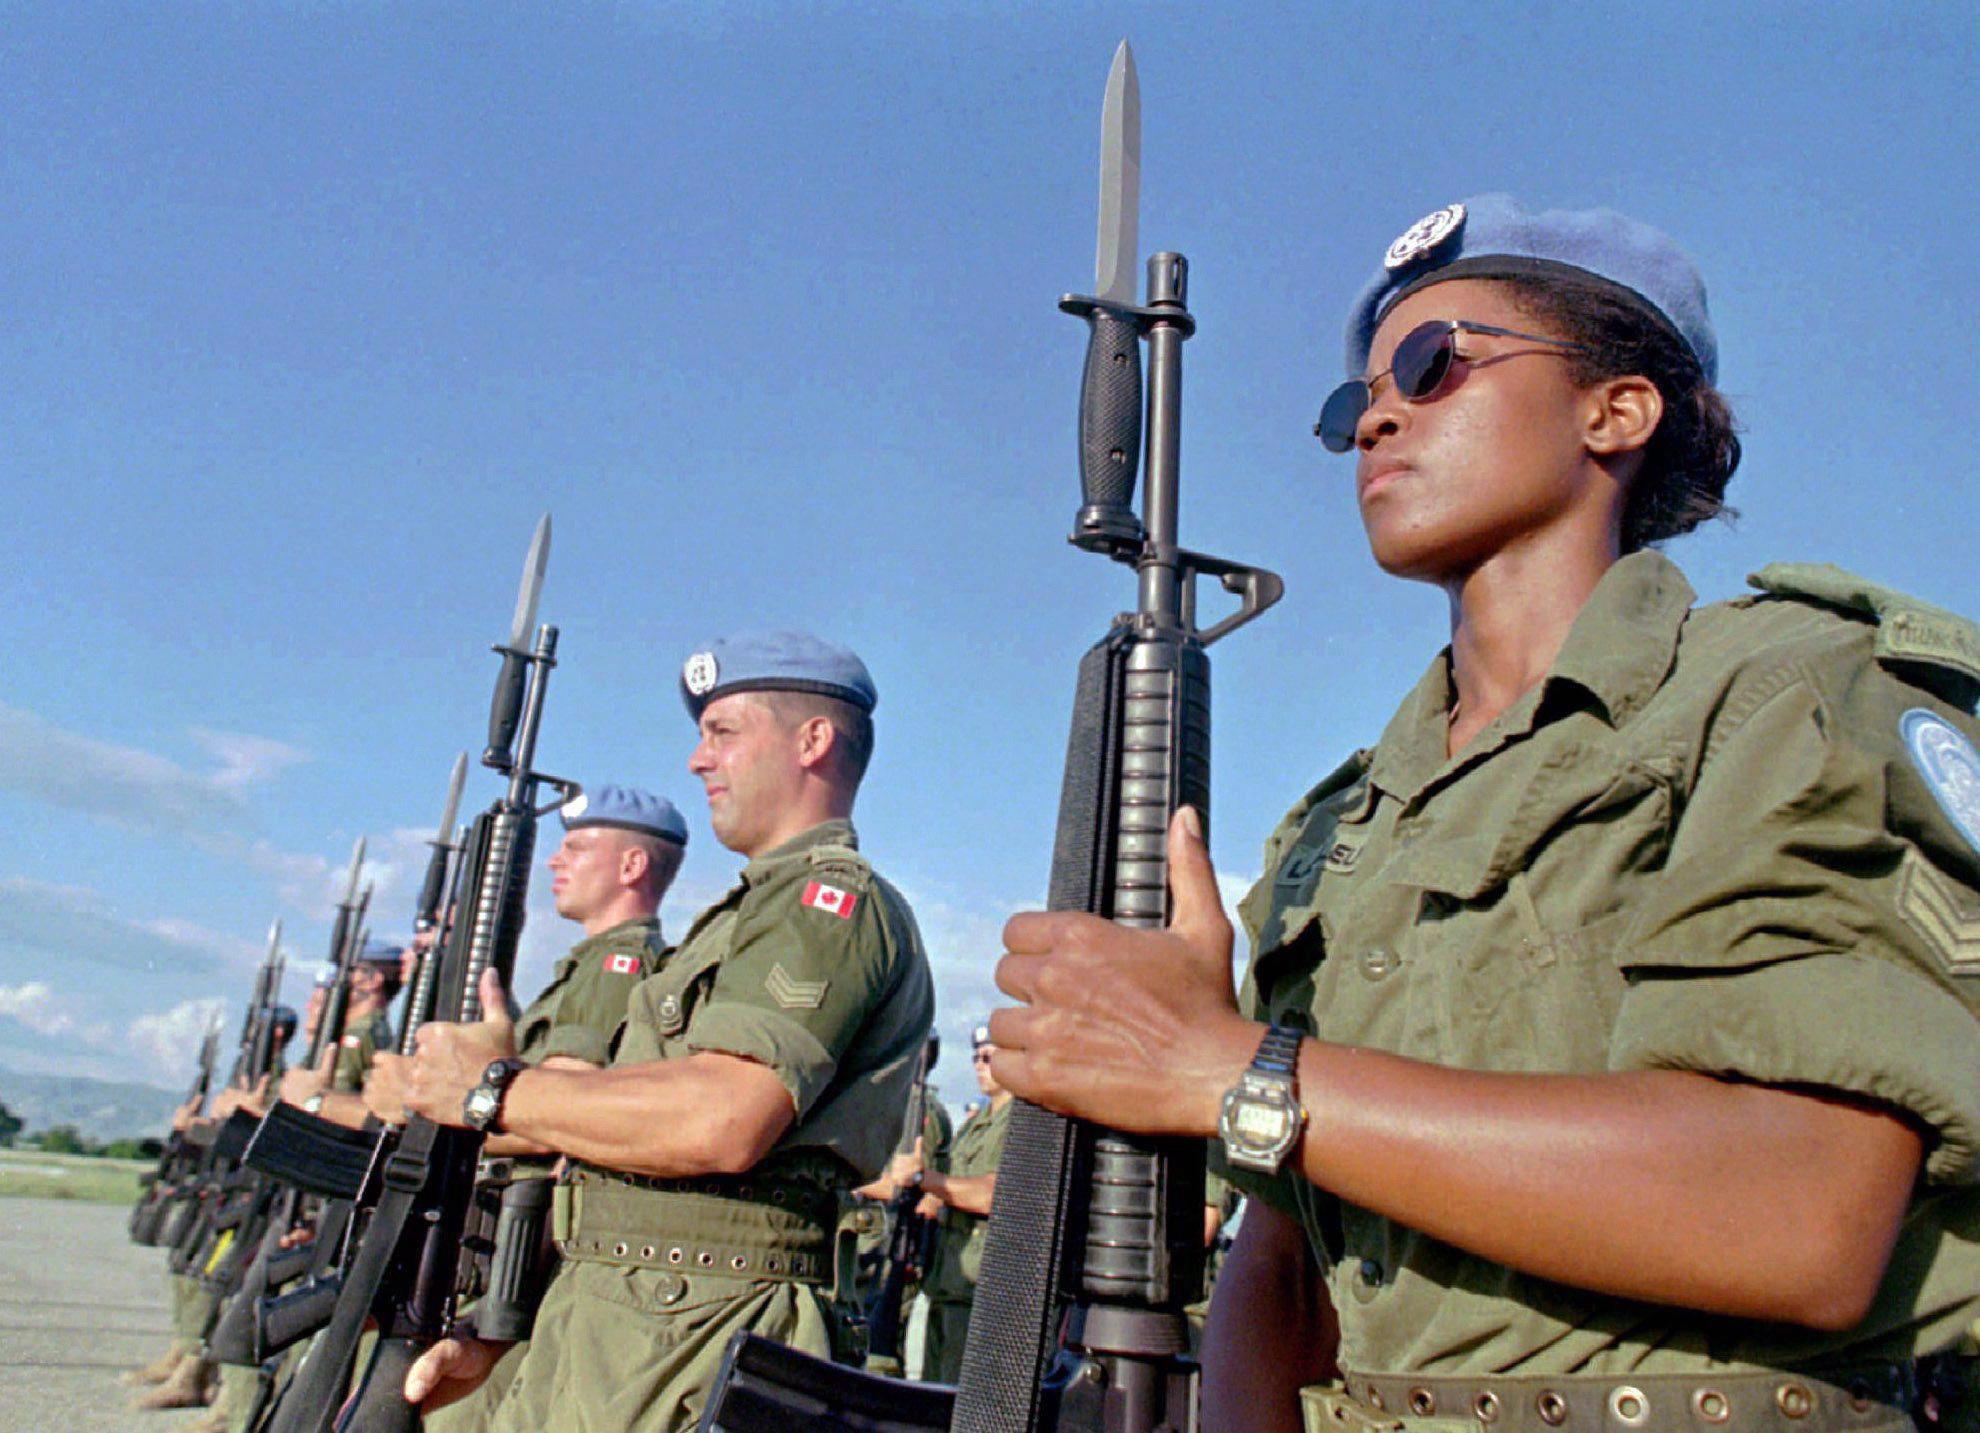 جنود كنديّون من قوّات حفظ السلام في هايتي في 28-11-1997/CANADIAN PRESS/AP, Daniel Morel